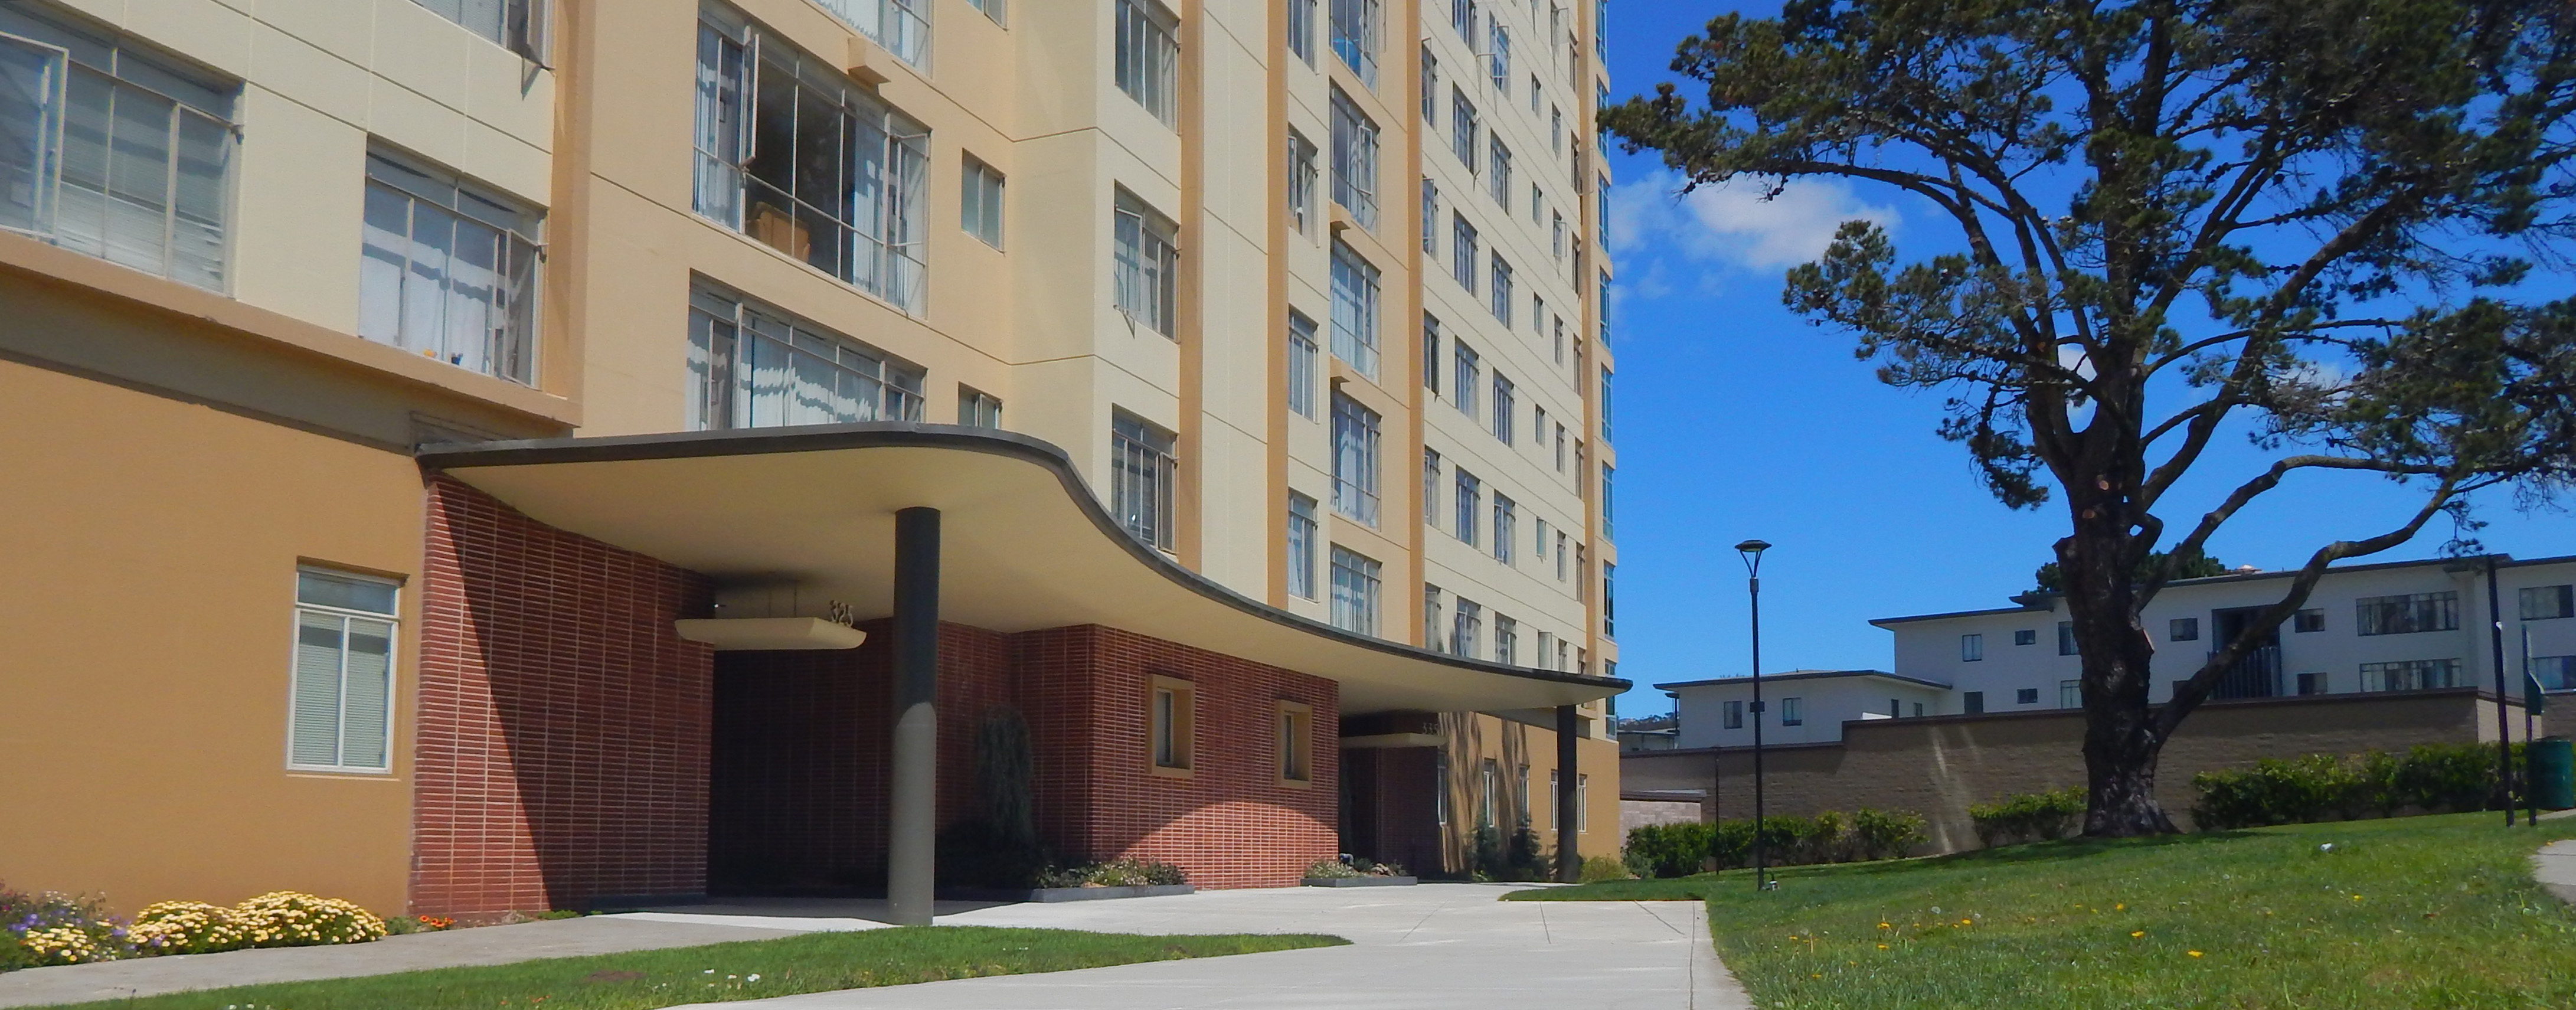 University Park North High Rise Apartments